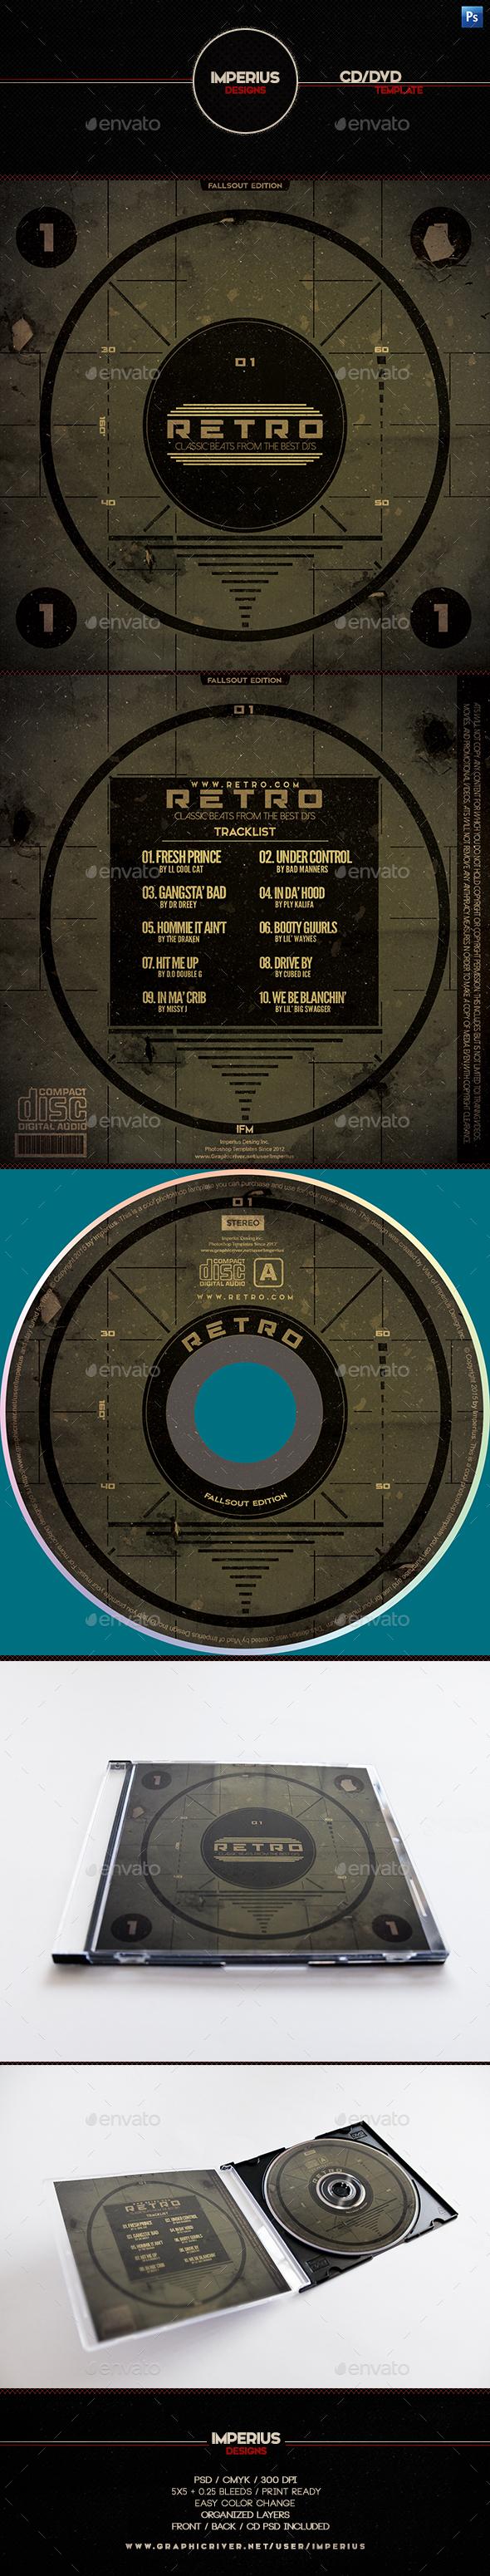 Retro CD/DVD Cover - CD & DVD Artwork Print Templates